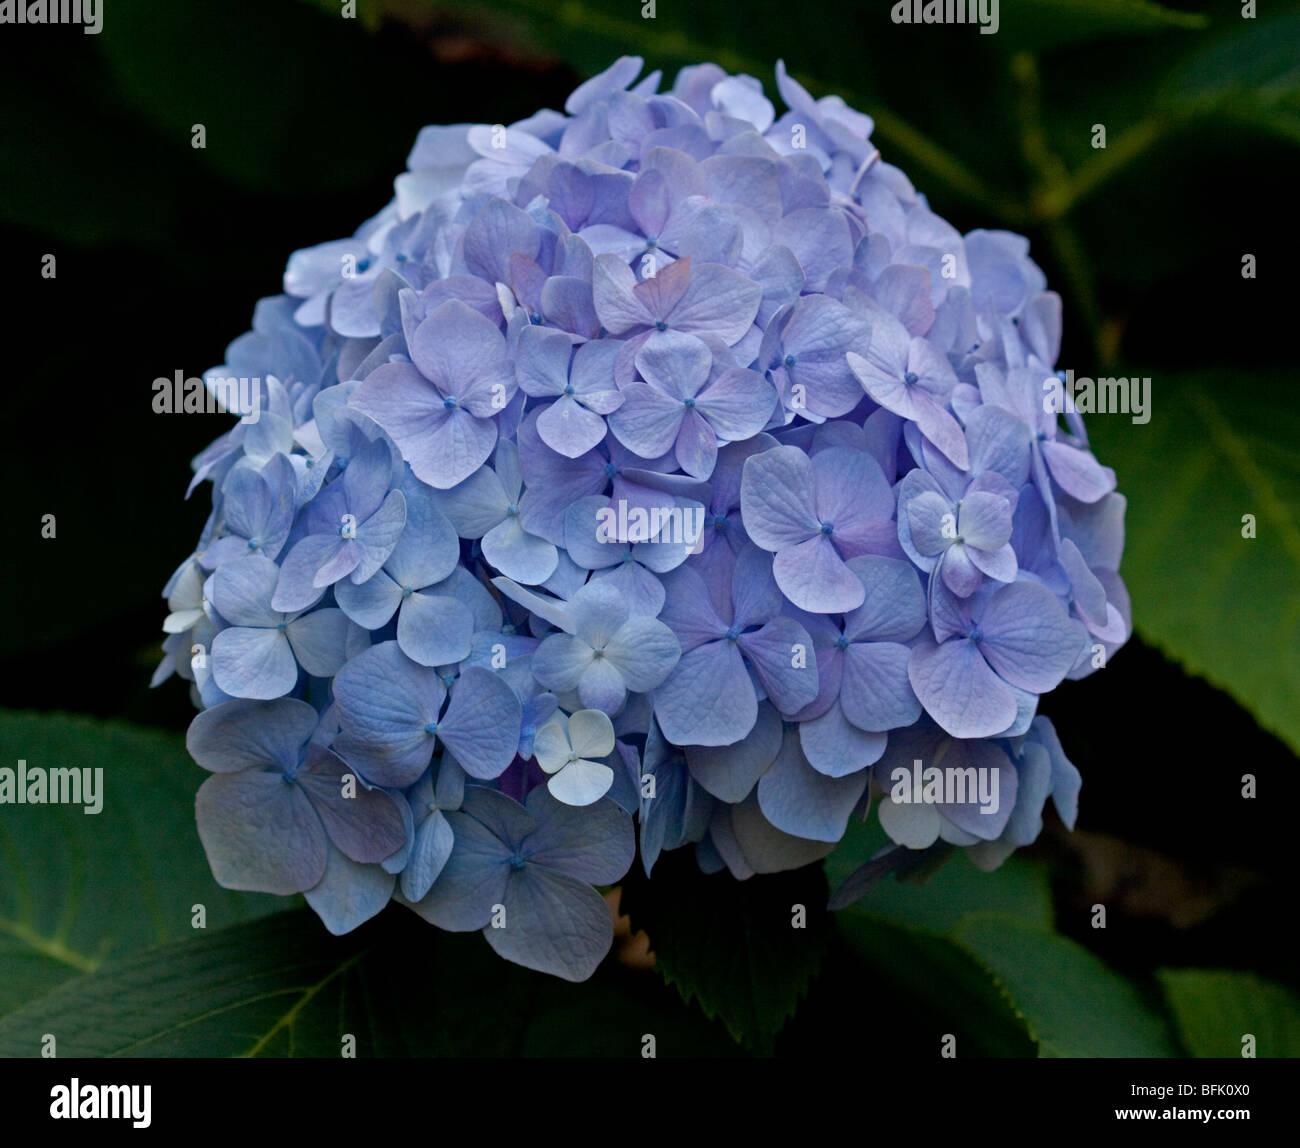 Blue Hydrangea - Stock Image